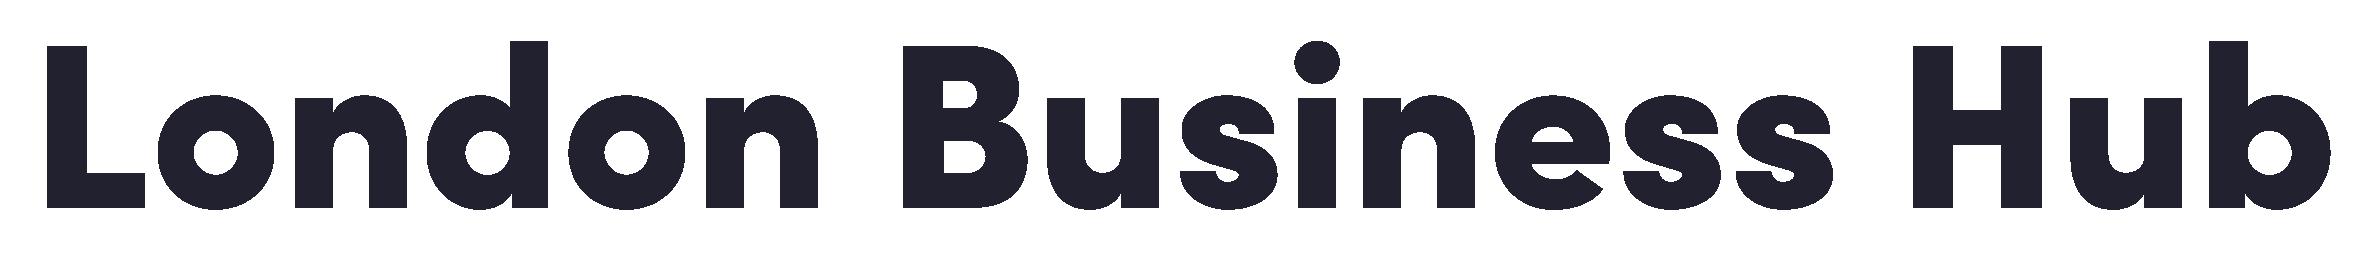 London Business Hub Logo